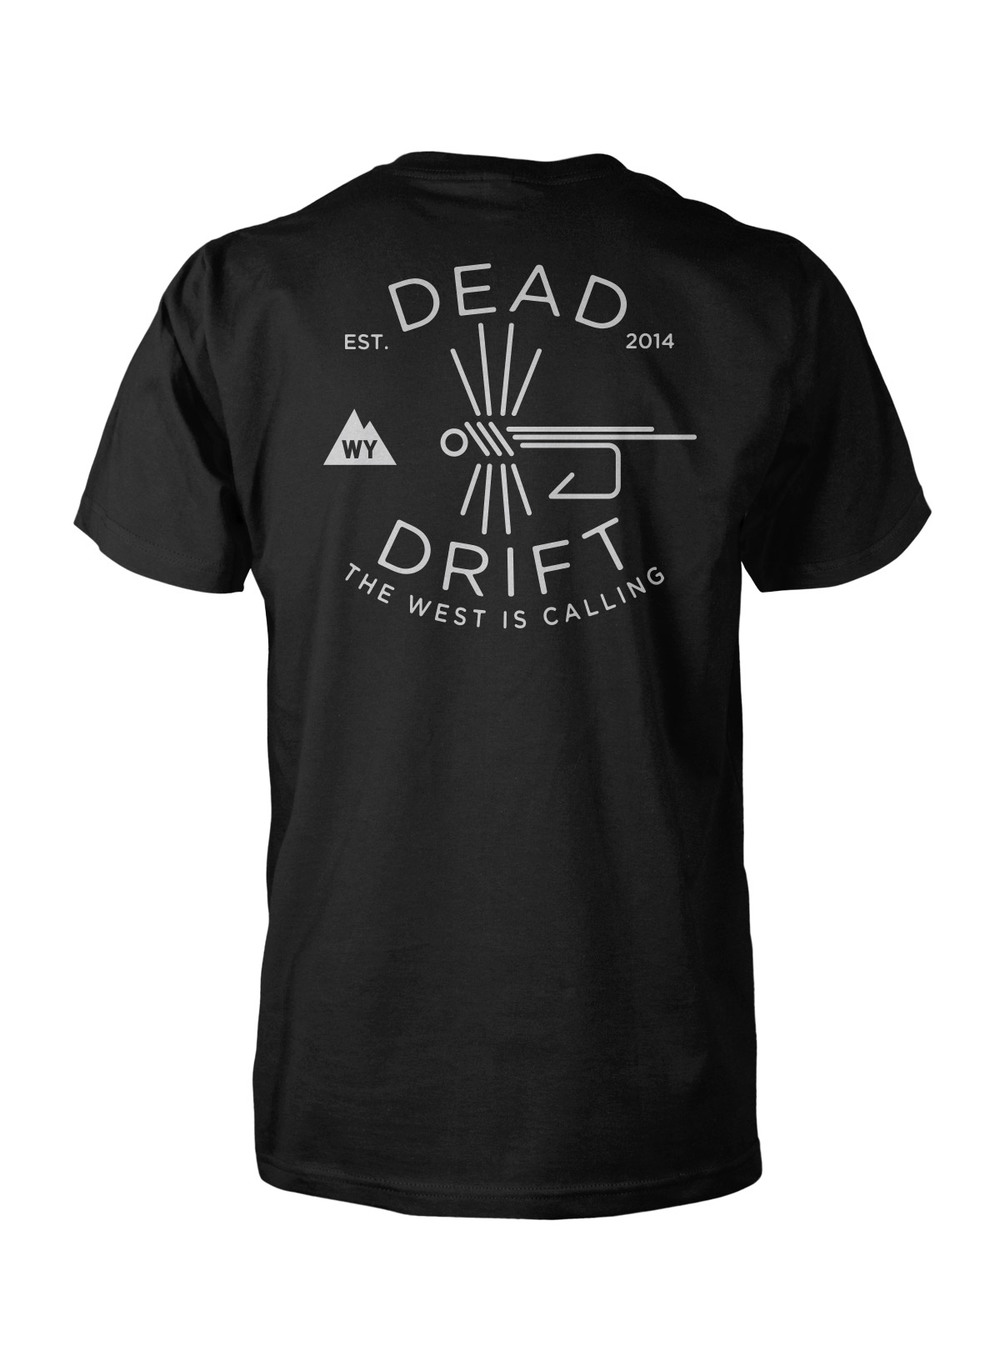 Dead drift fly fish hook tee dead drift for Fly fishing shirt